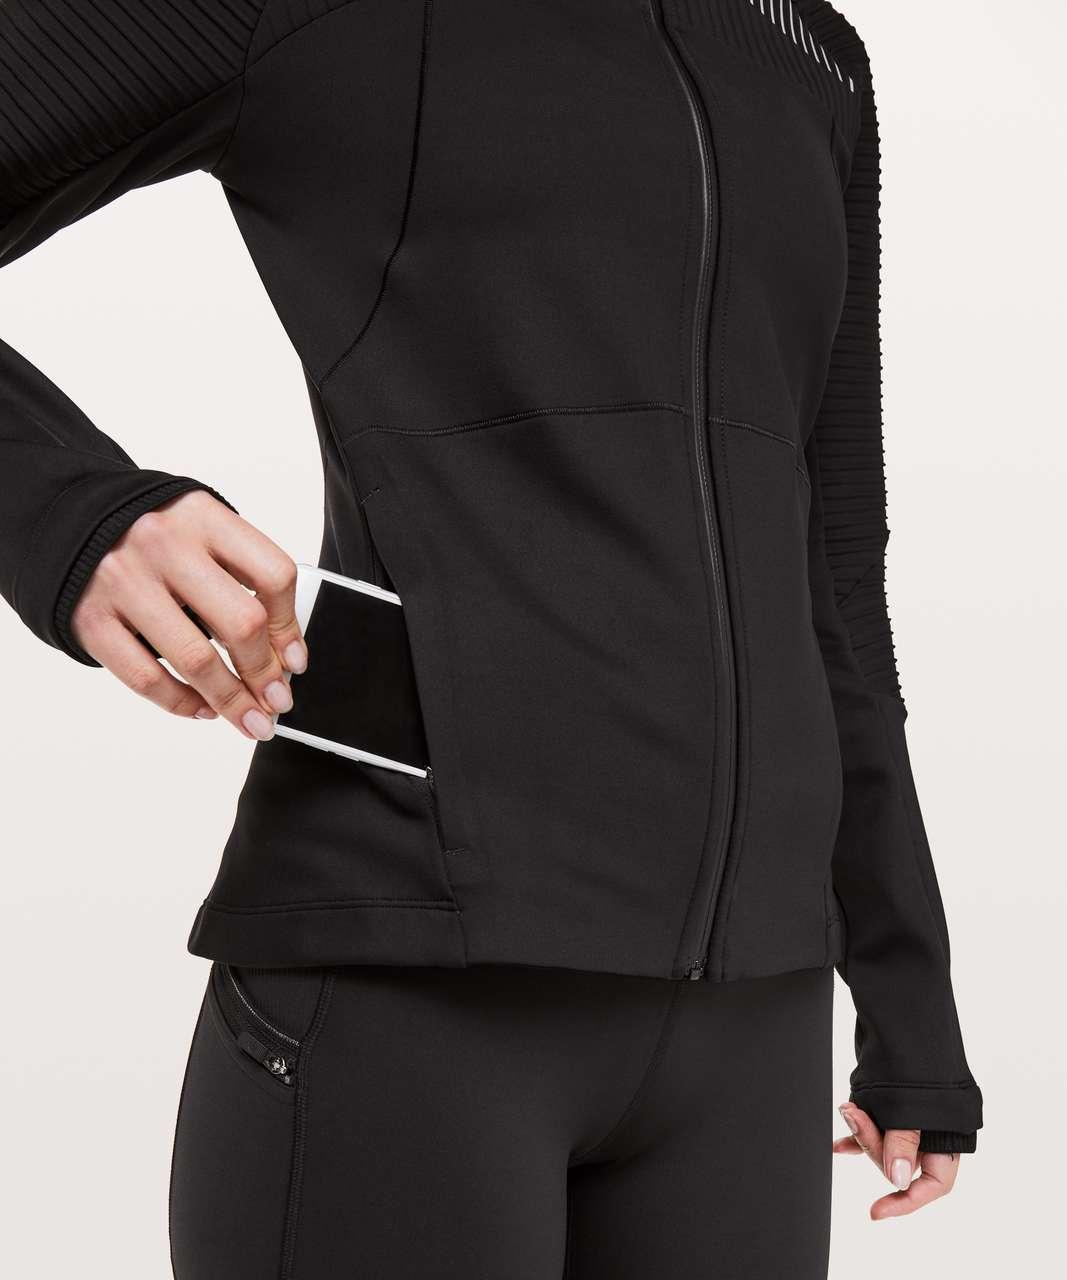 Lululemon Chill Going Strong Jacket - Black